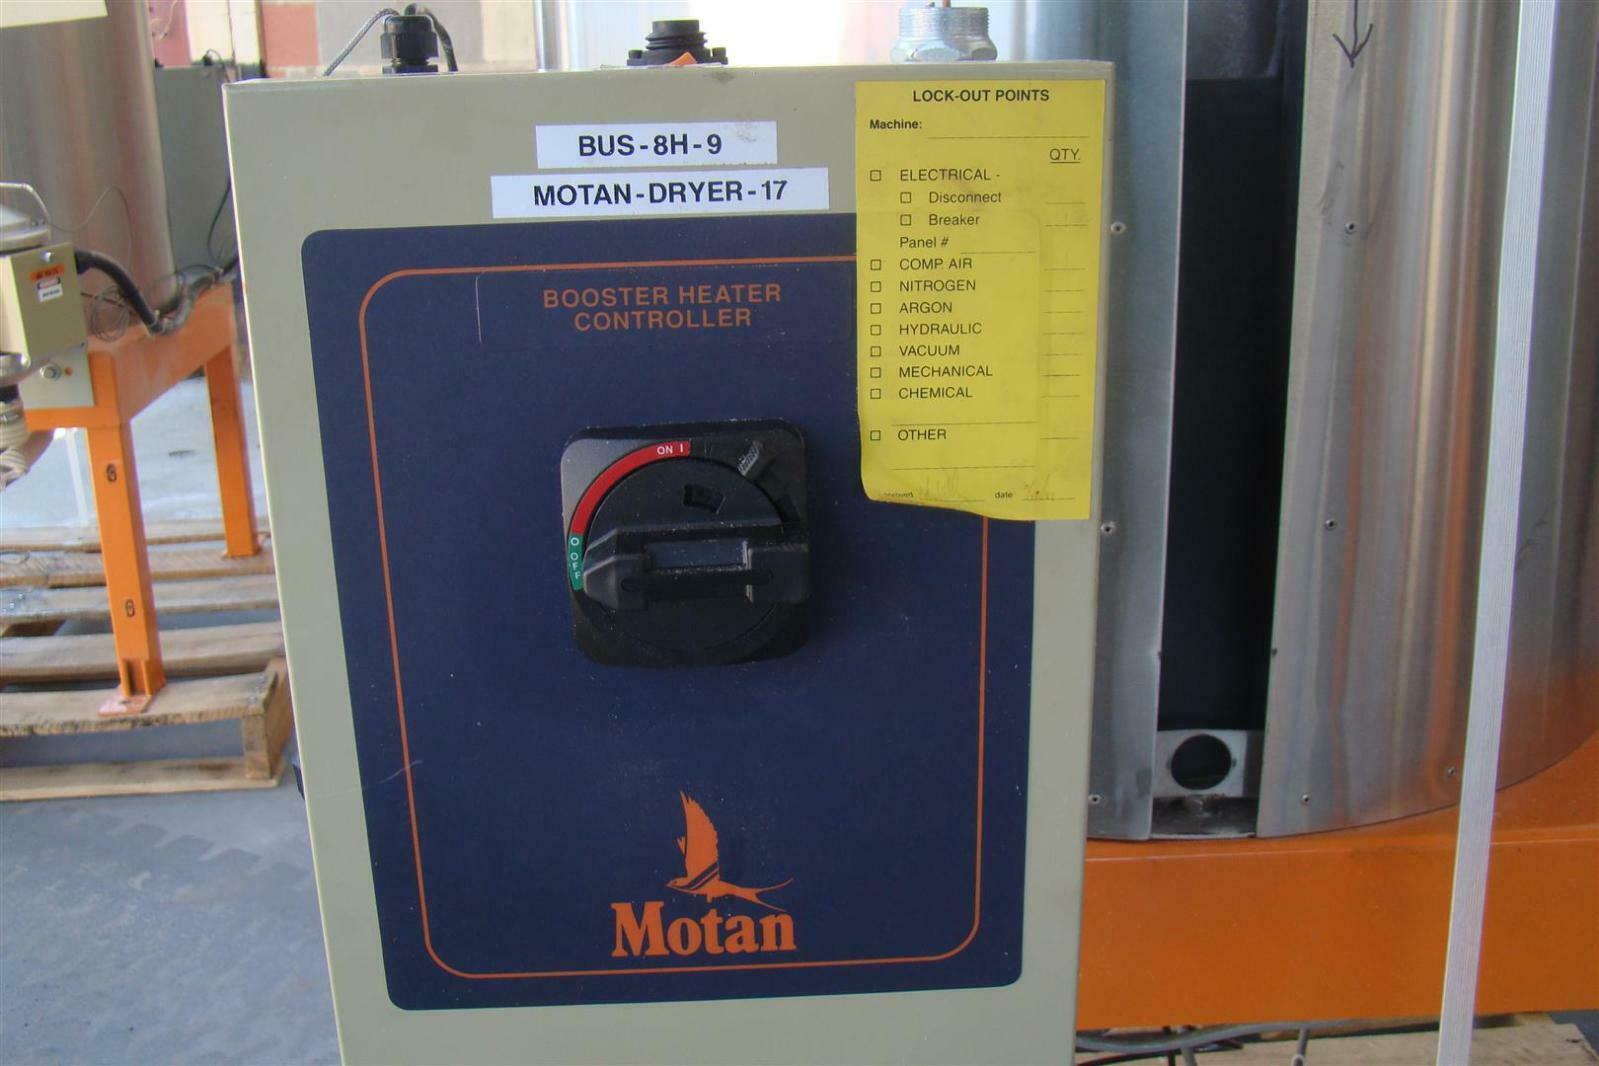 MOTAN STAINLESS STEEL PELLET DRYER 17 BUS-8H-9 BOOSTER HEATER CONTROLLER